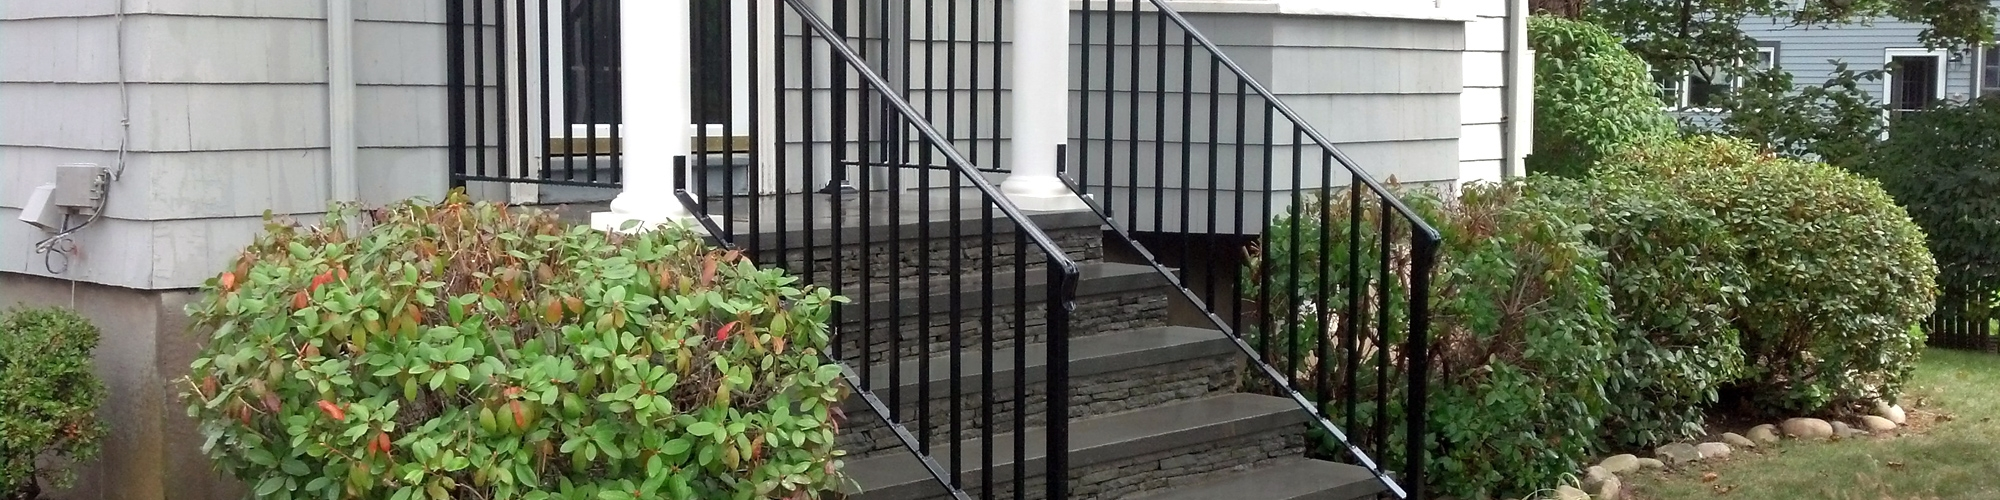 Wrought Iron Railings Ma Ri Custom Iron Hand Rails Ornamental | Wrought Iron Hand Railing Exterior | Cast Iron | Steel | Steps | Deck | Iron Stair Rail